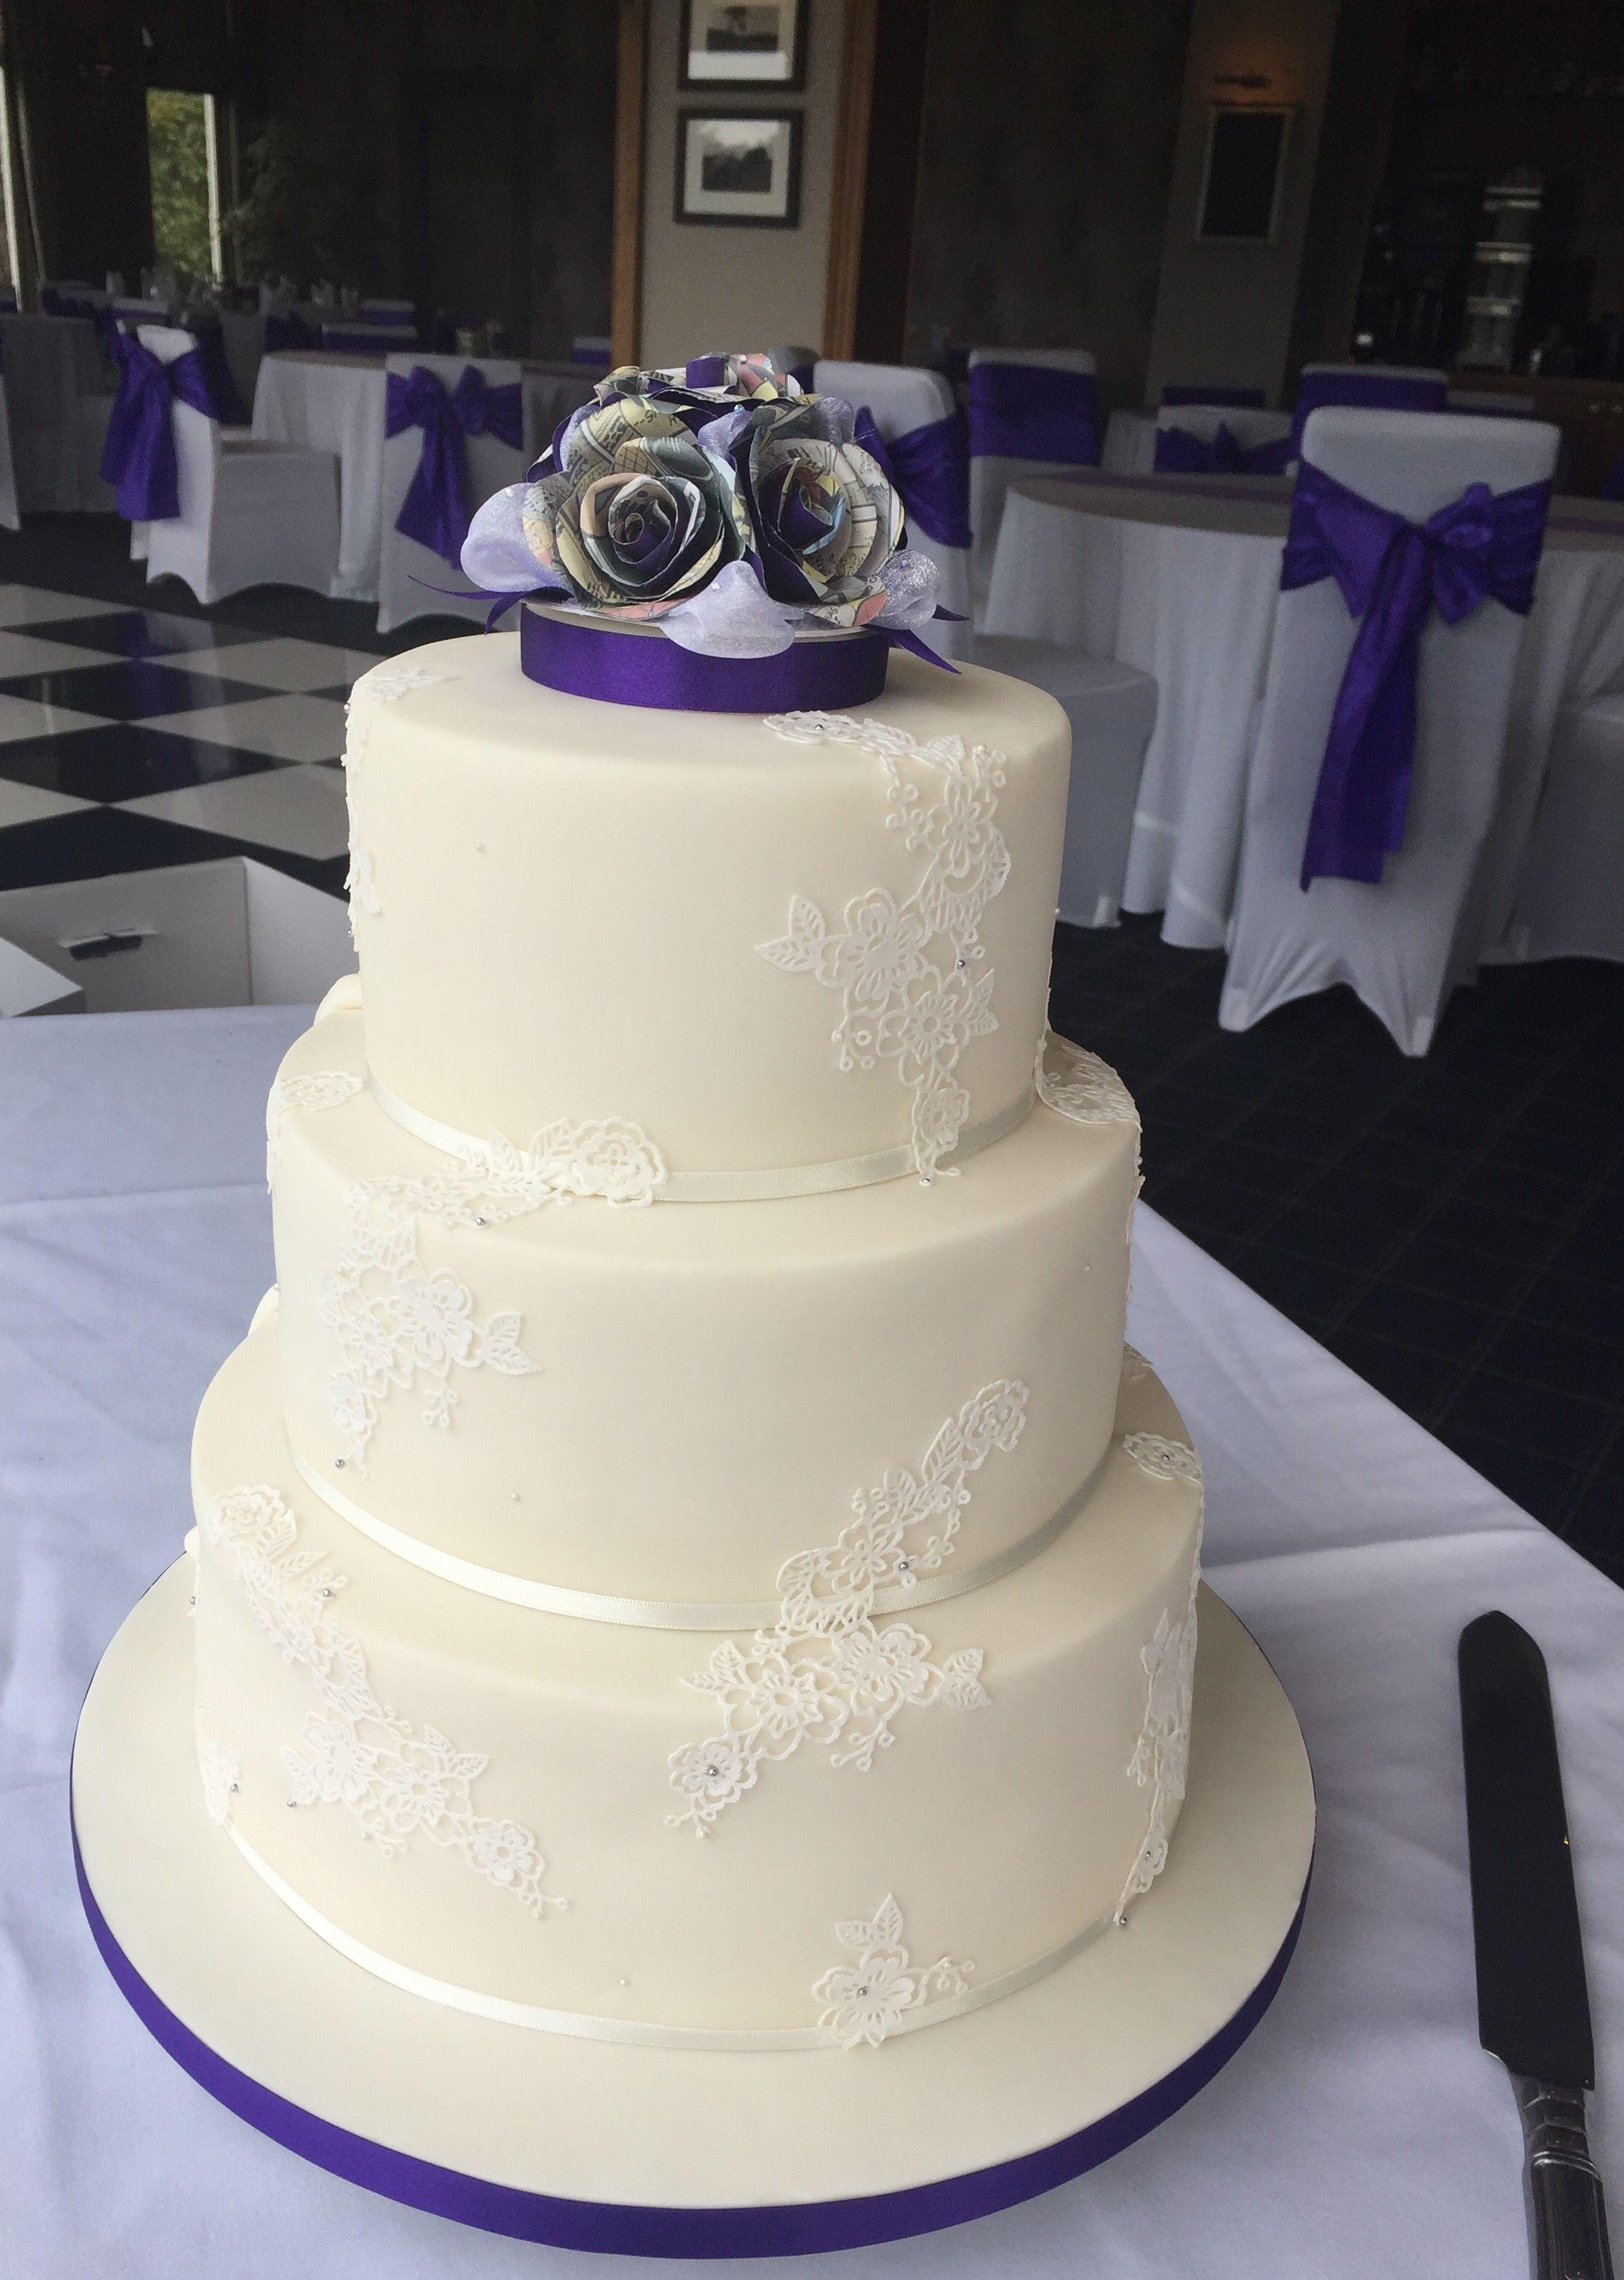 Reveal cake, Batman & Marvel themed wedding cake | Bake A Memory ...